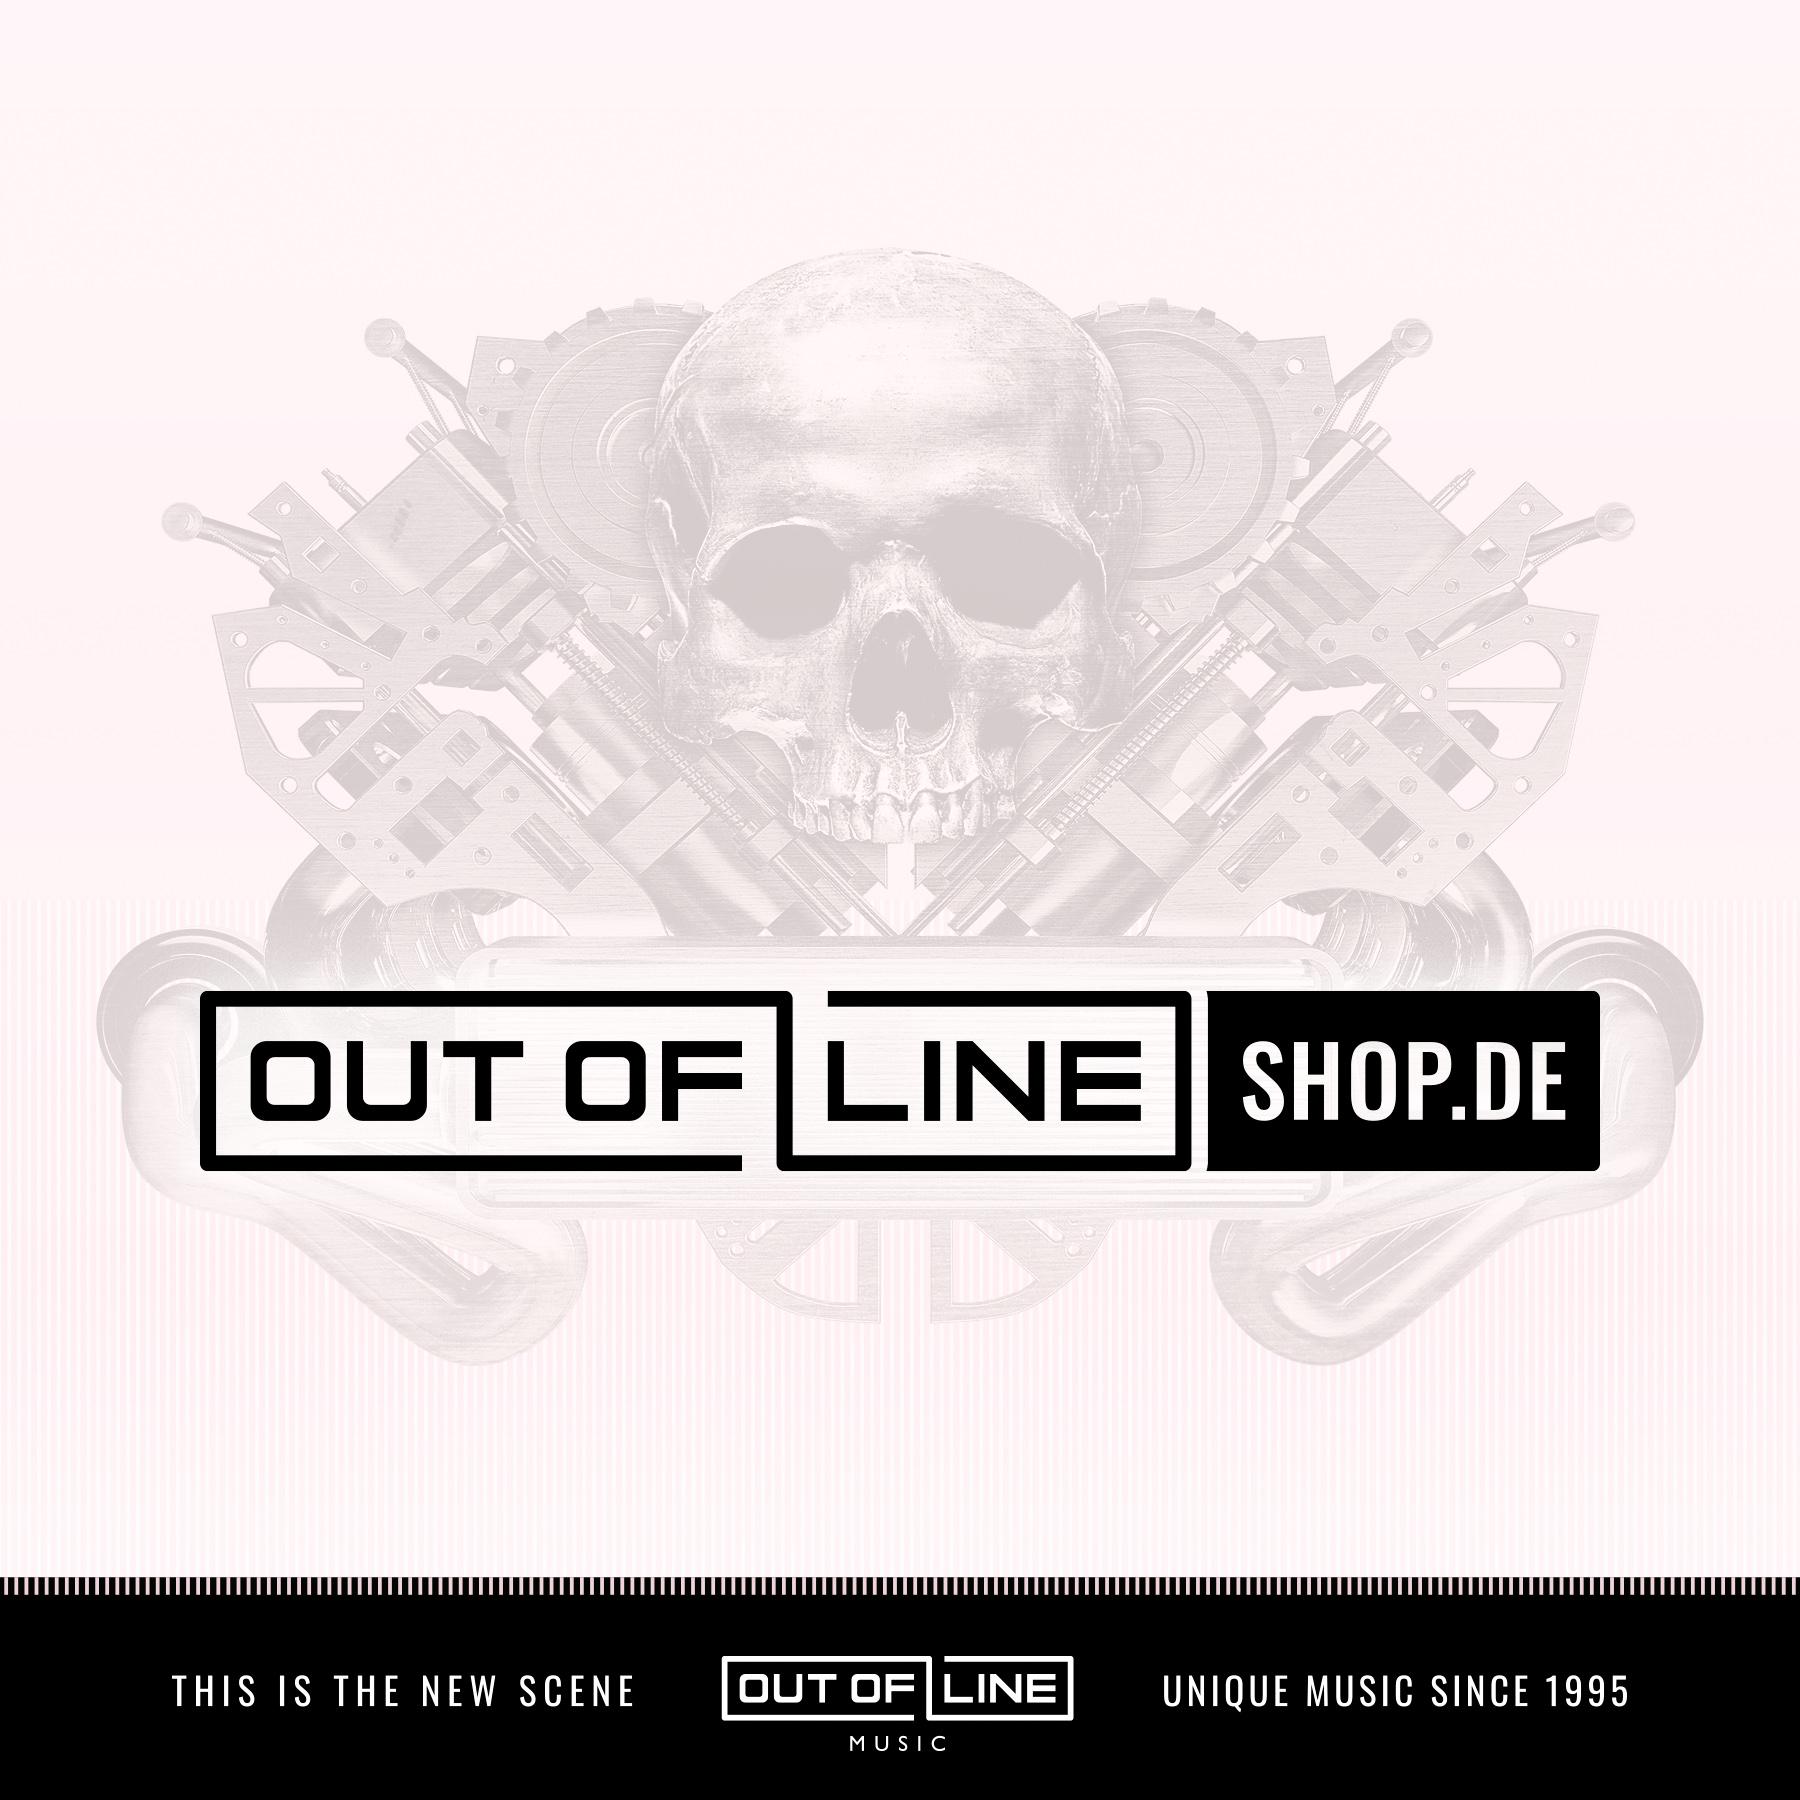 Agonoize - Blutgruppe Jesus (-) / Schmerzpervers 2.0 (Limited Edition) MaxiCD